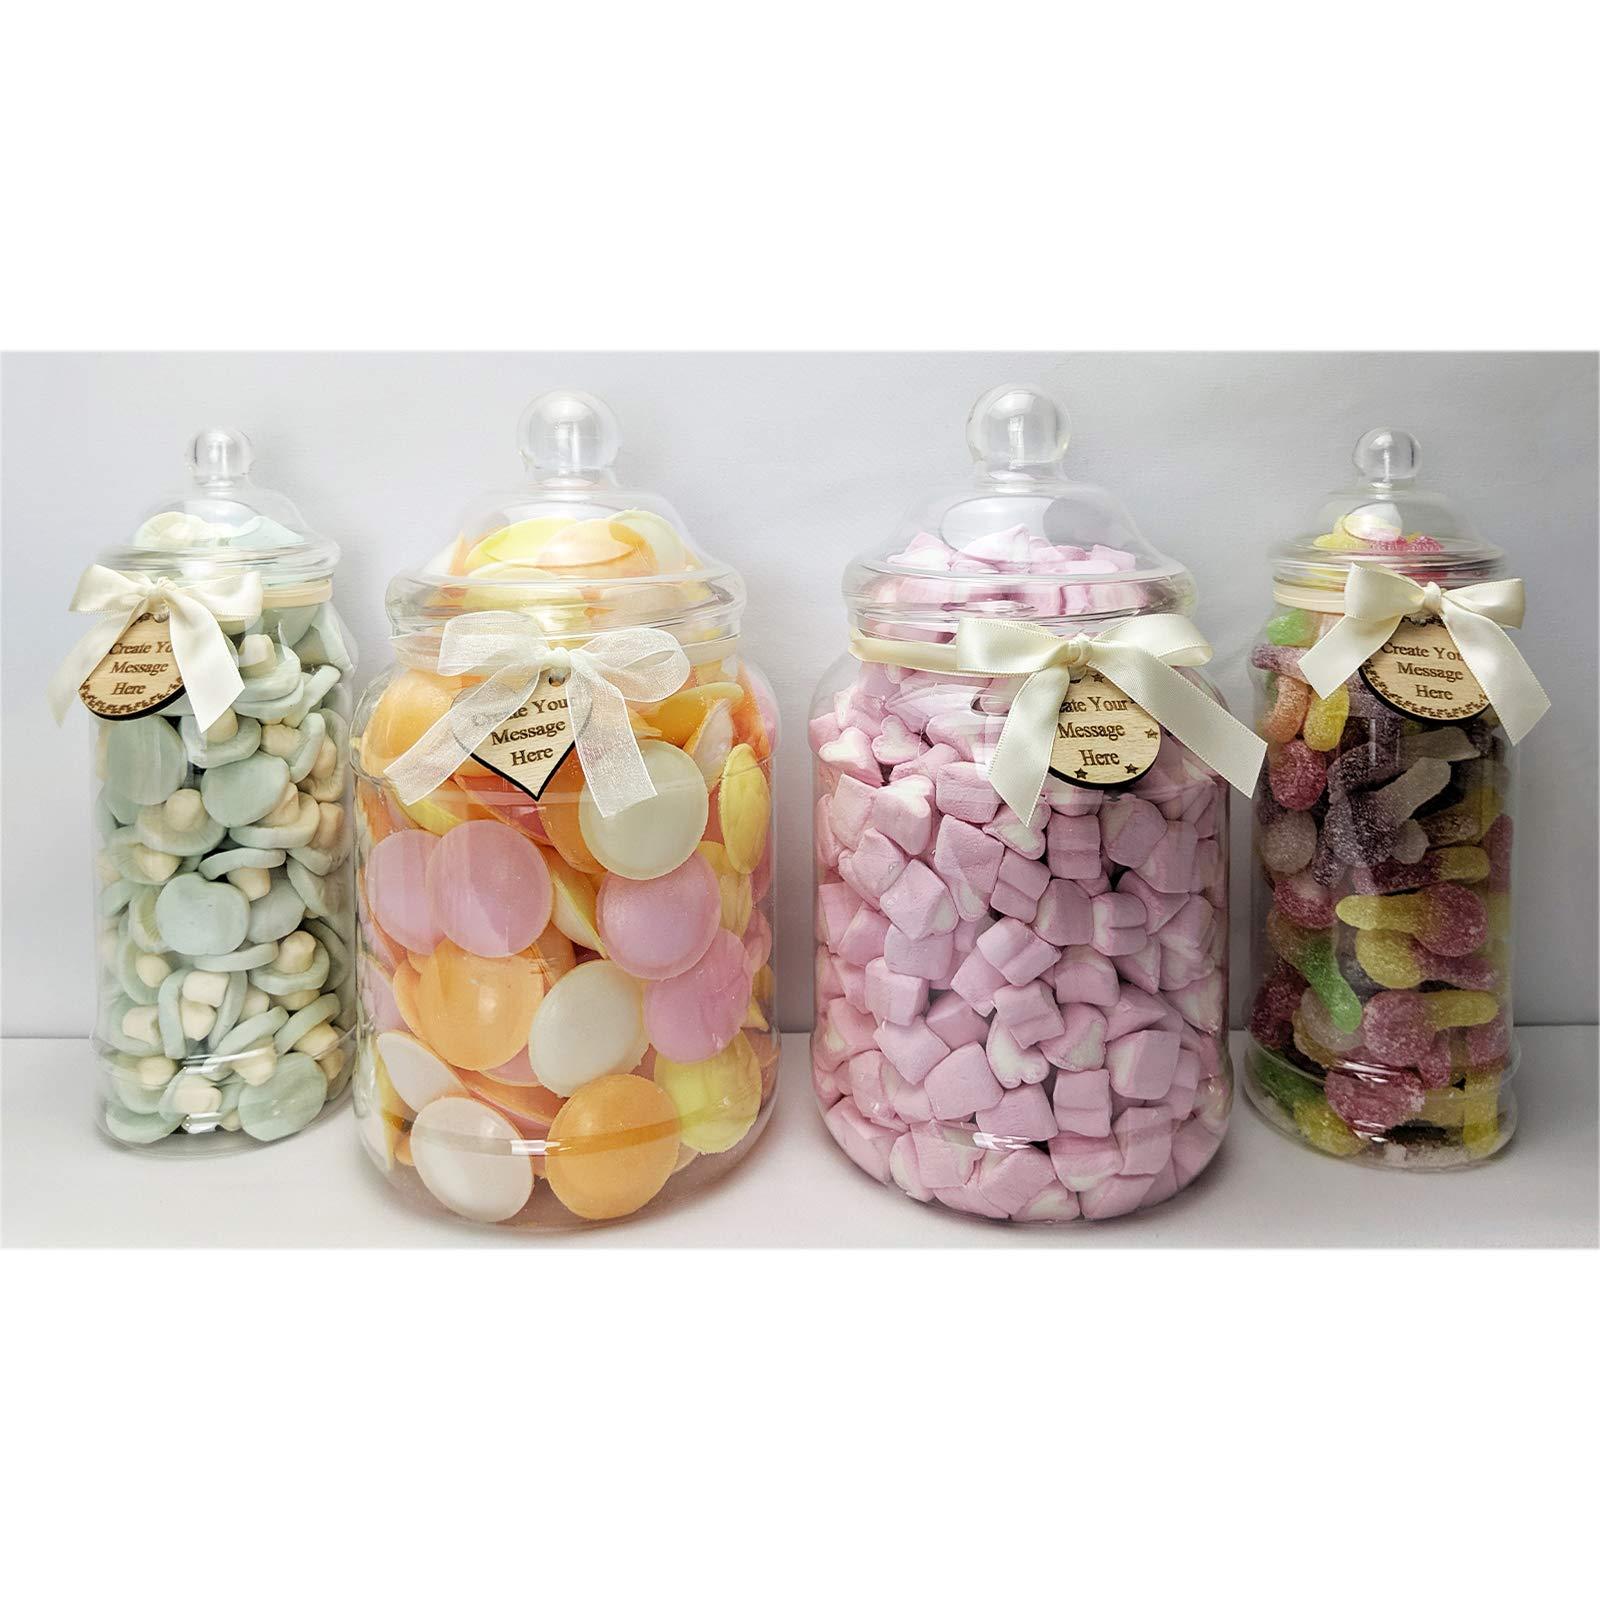 8 Vintage Plastic Sweet Jar Candy Buffet Wedding Party Kit Scoop Tong Stripe Bag